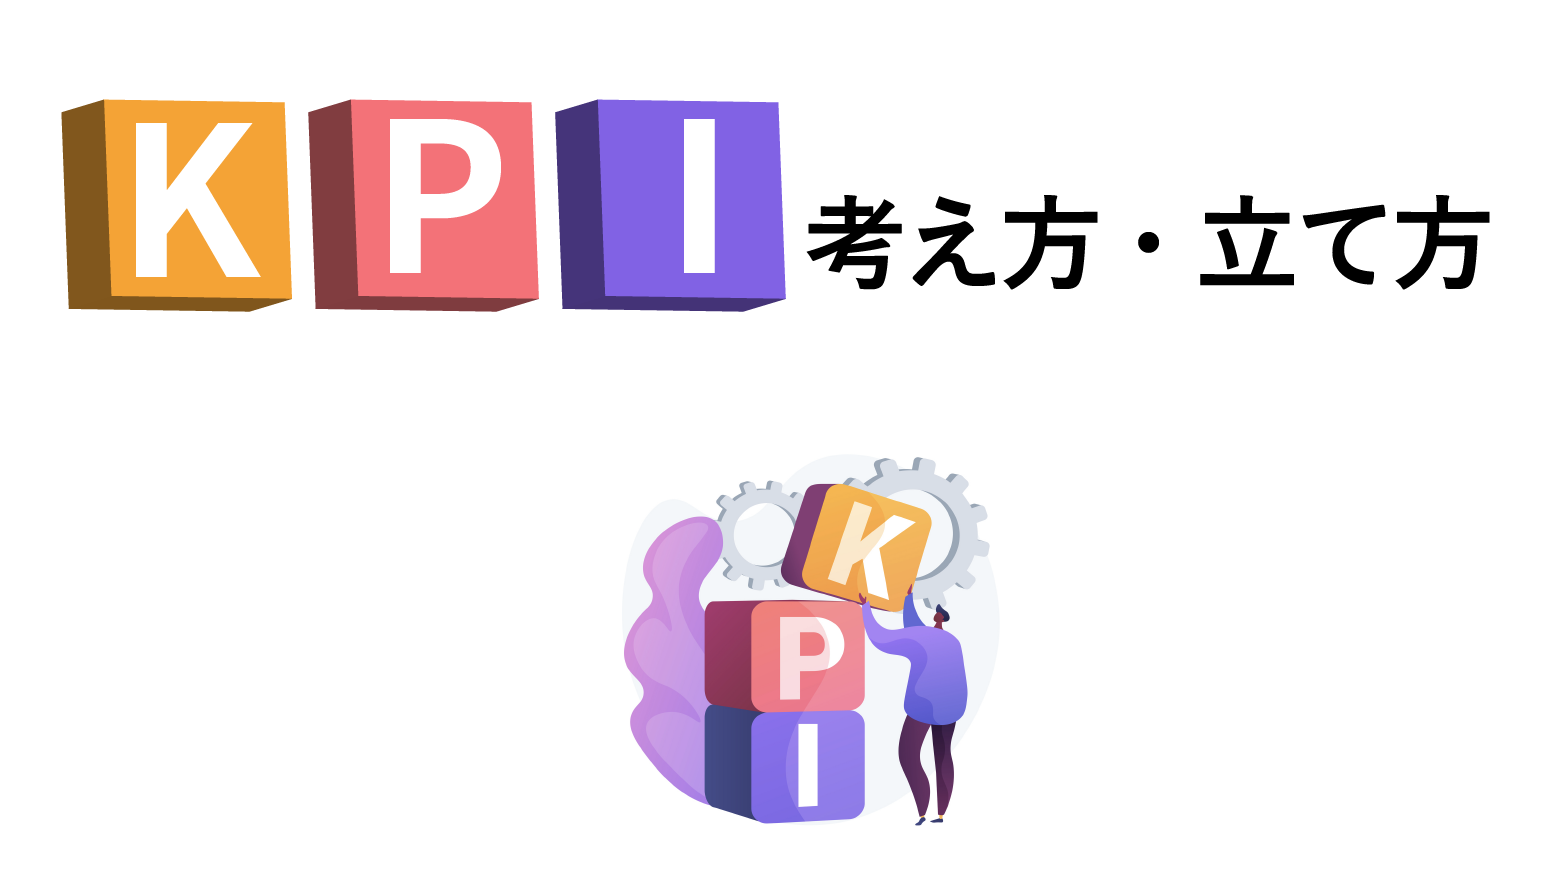 WebマーケティングにおけるKPIの考え方・立て方を解説